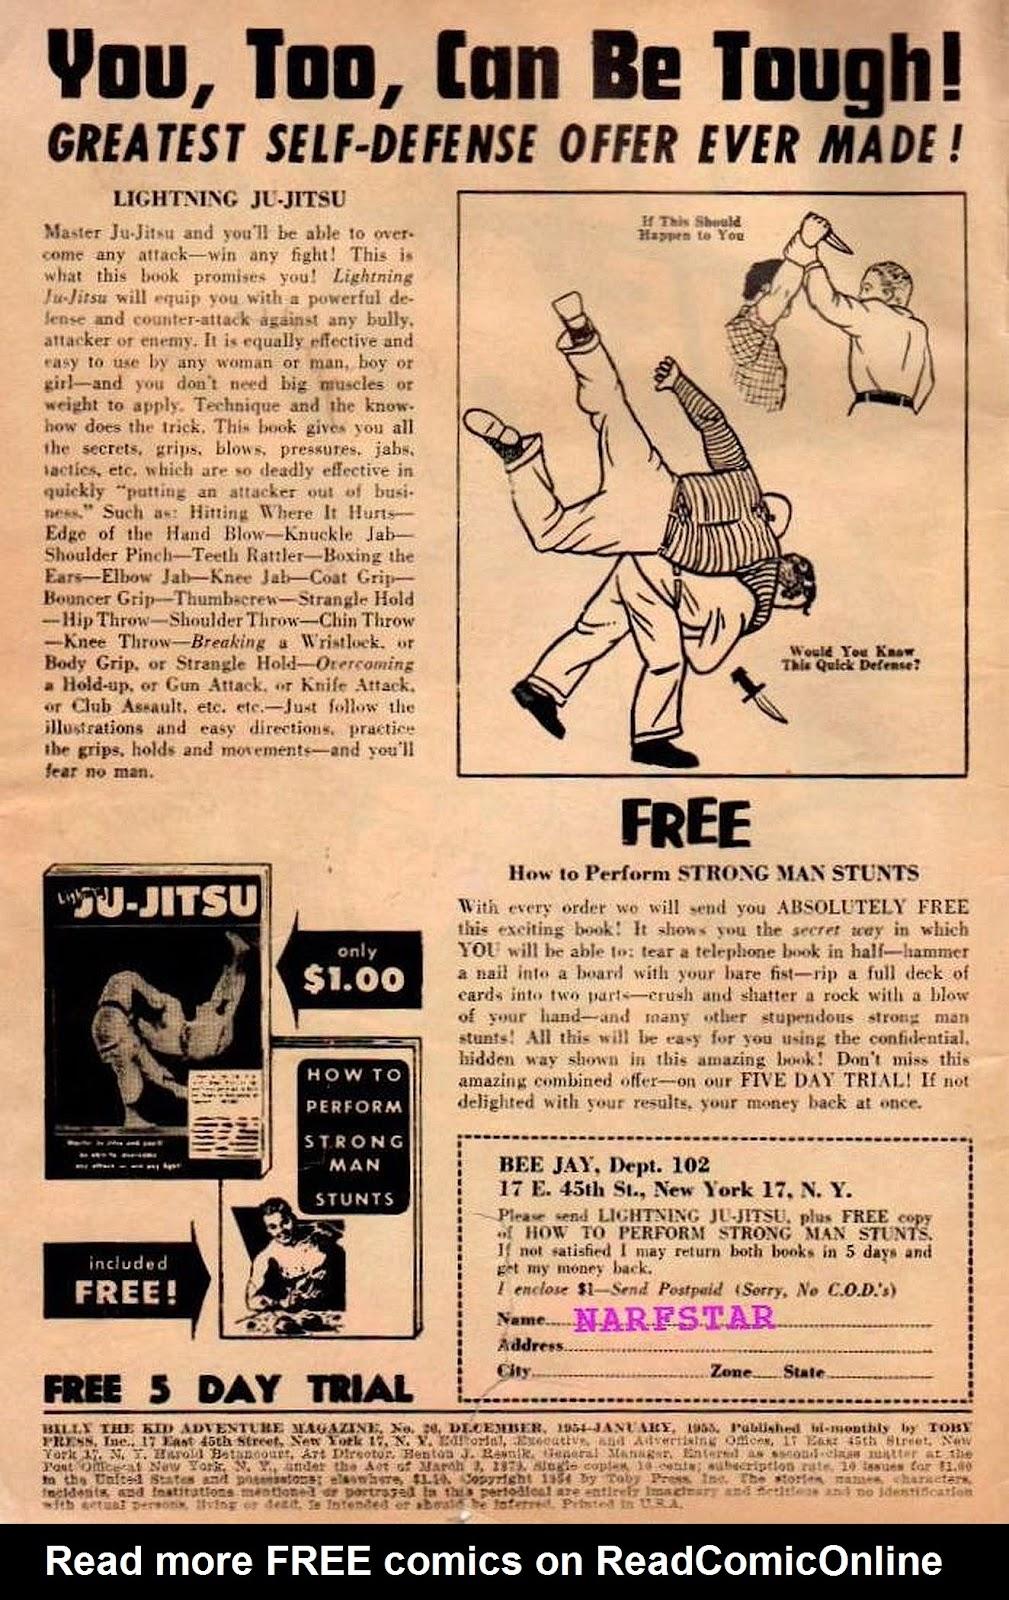 Billy the Kid Adventure Magazine 26 Page 2